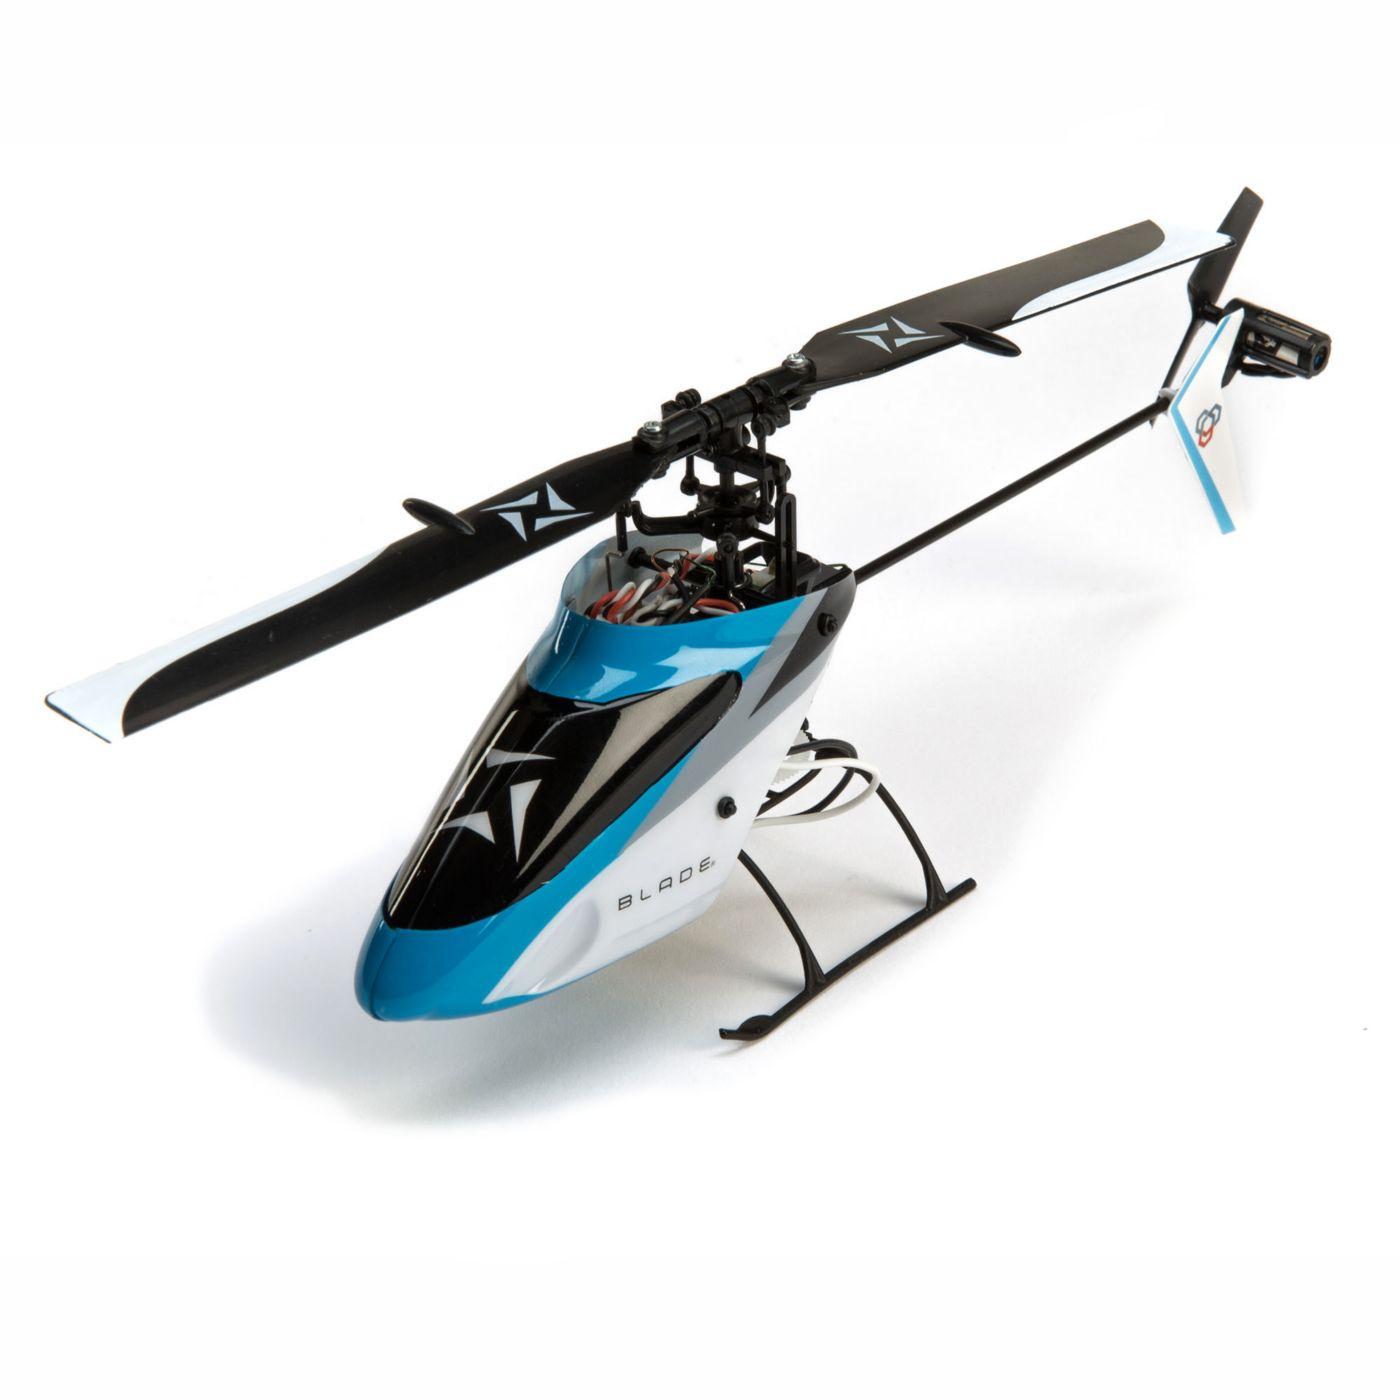 Horizon Hobby Nano S2 Helicopter RTF